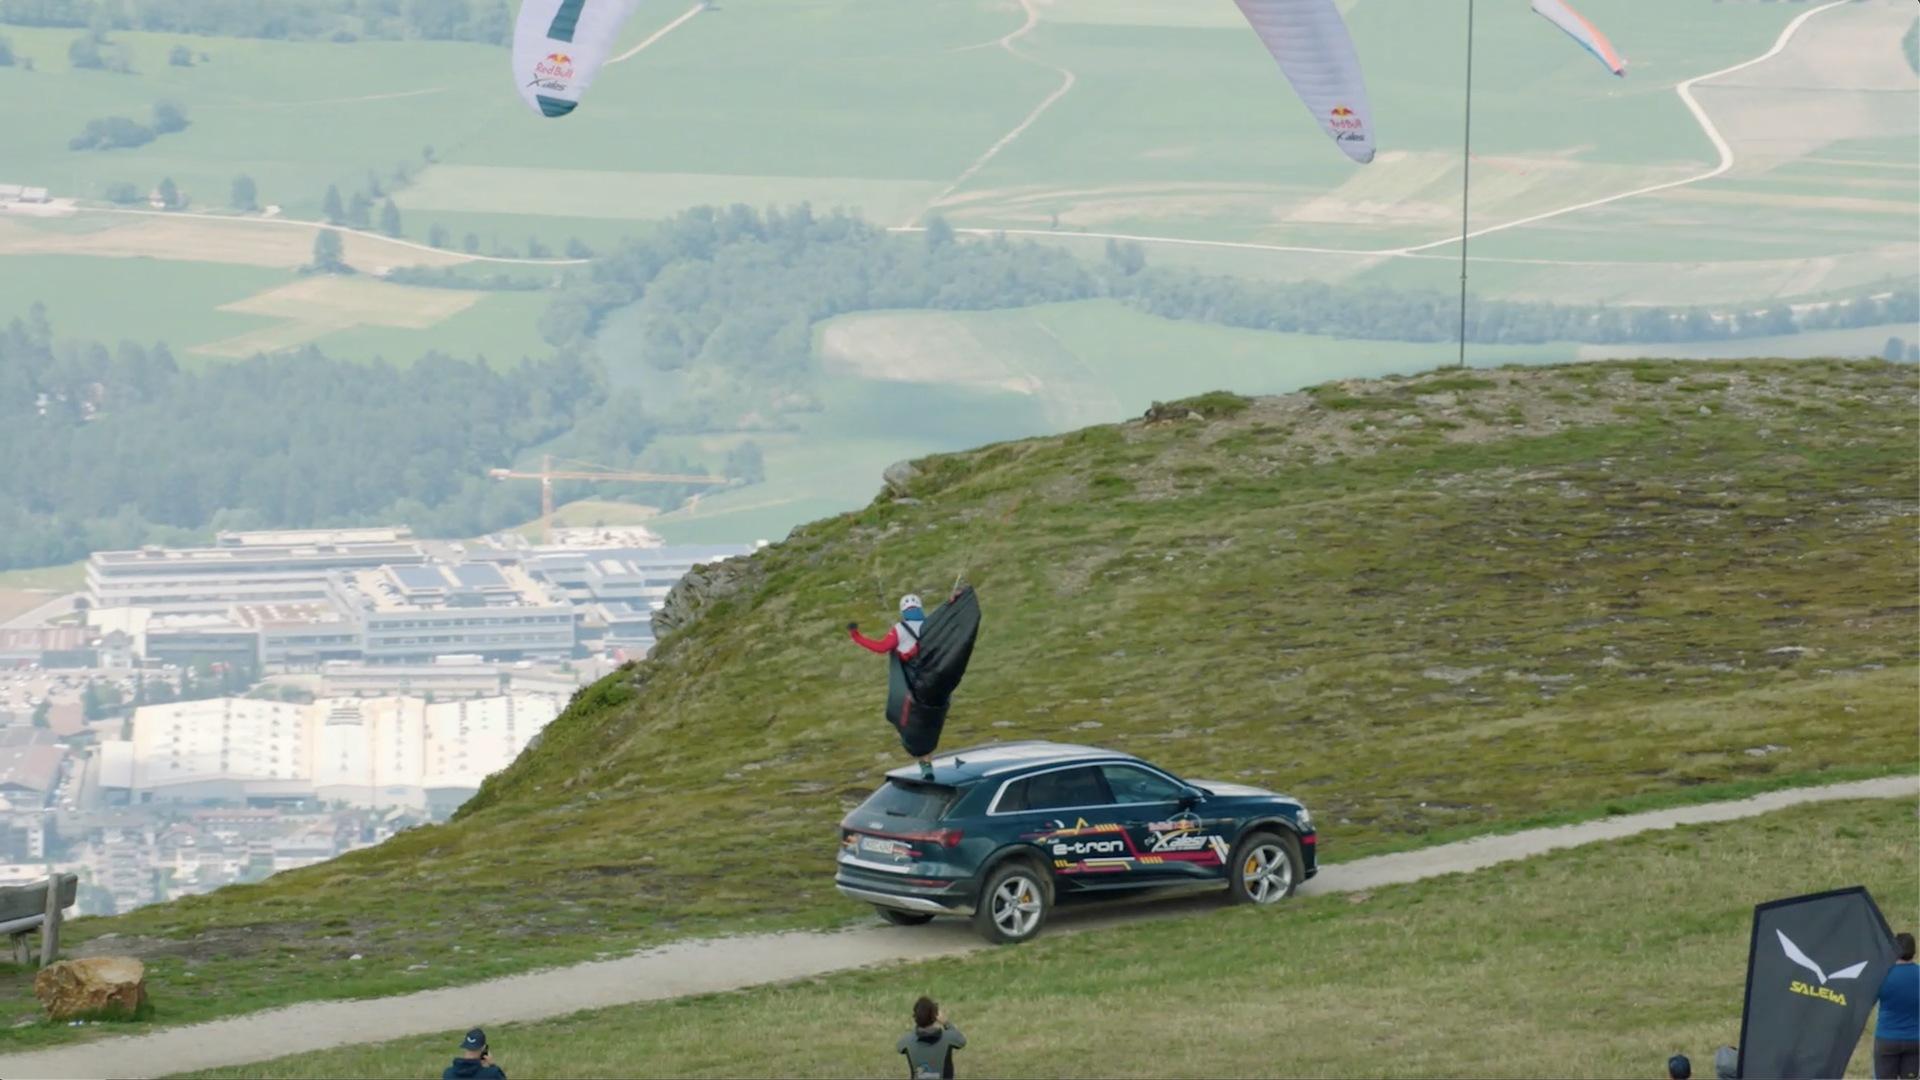 Extremsport am Limit: Audi e-tron bei den X-Alps